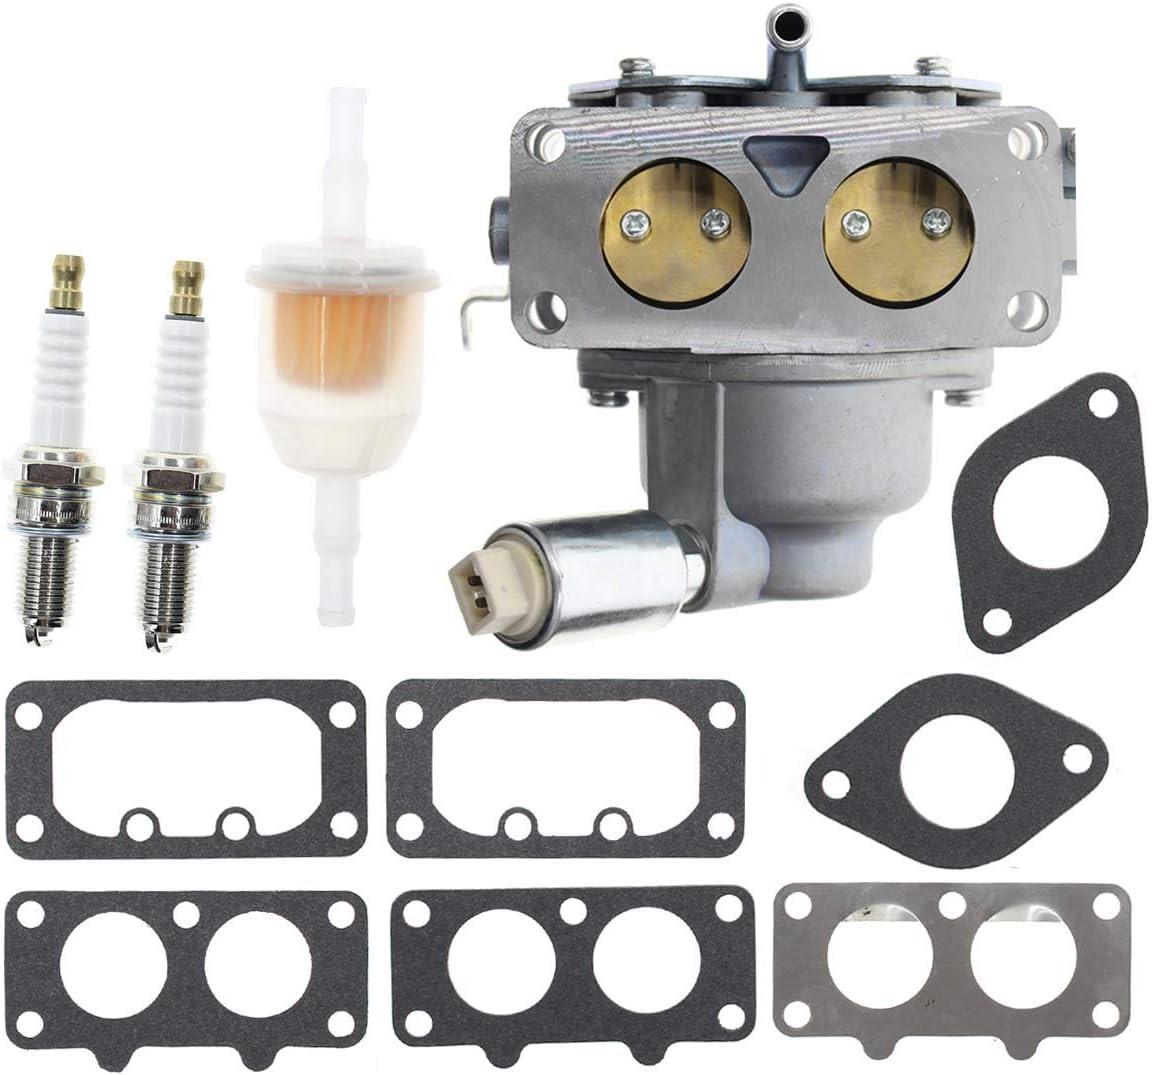 Carbhub 405777 free shipping Popular brand Carburetor for Briggs 40 Stratton 406777